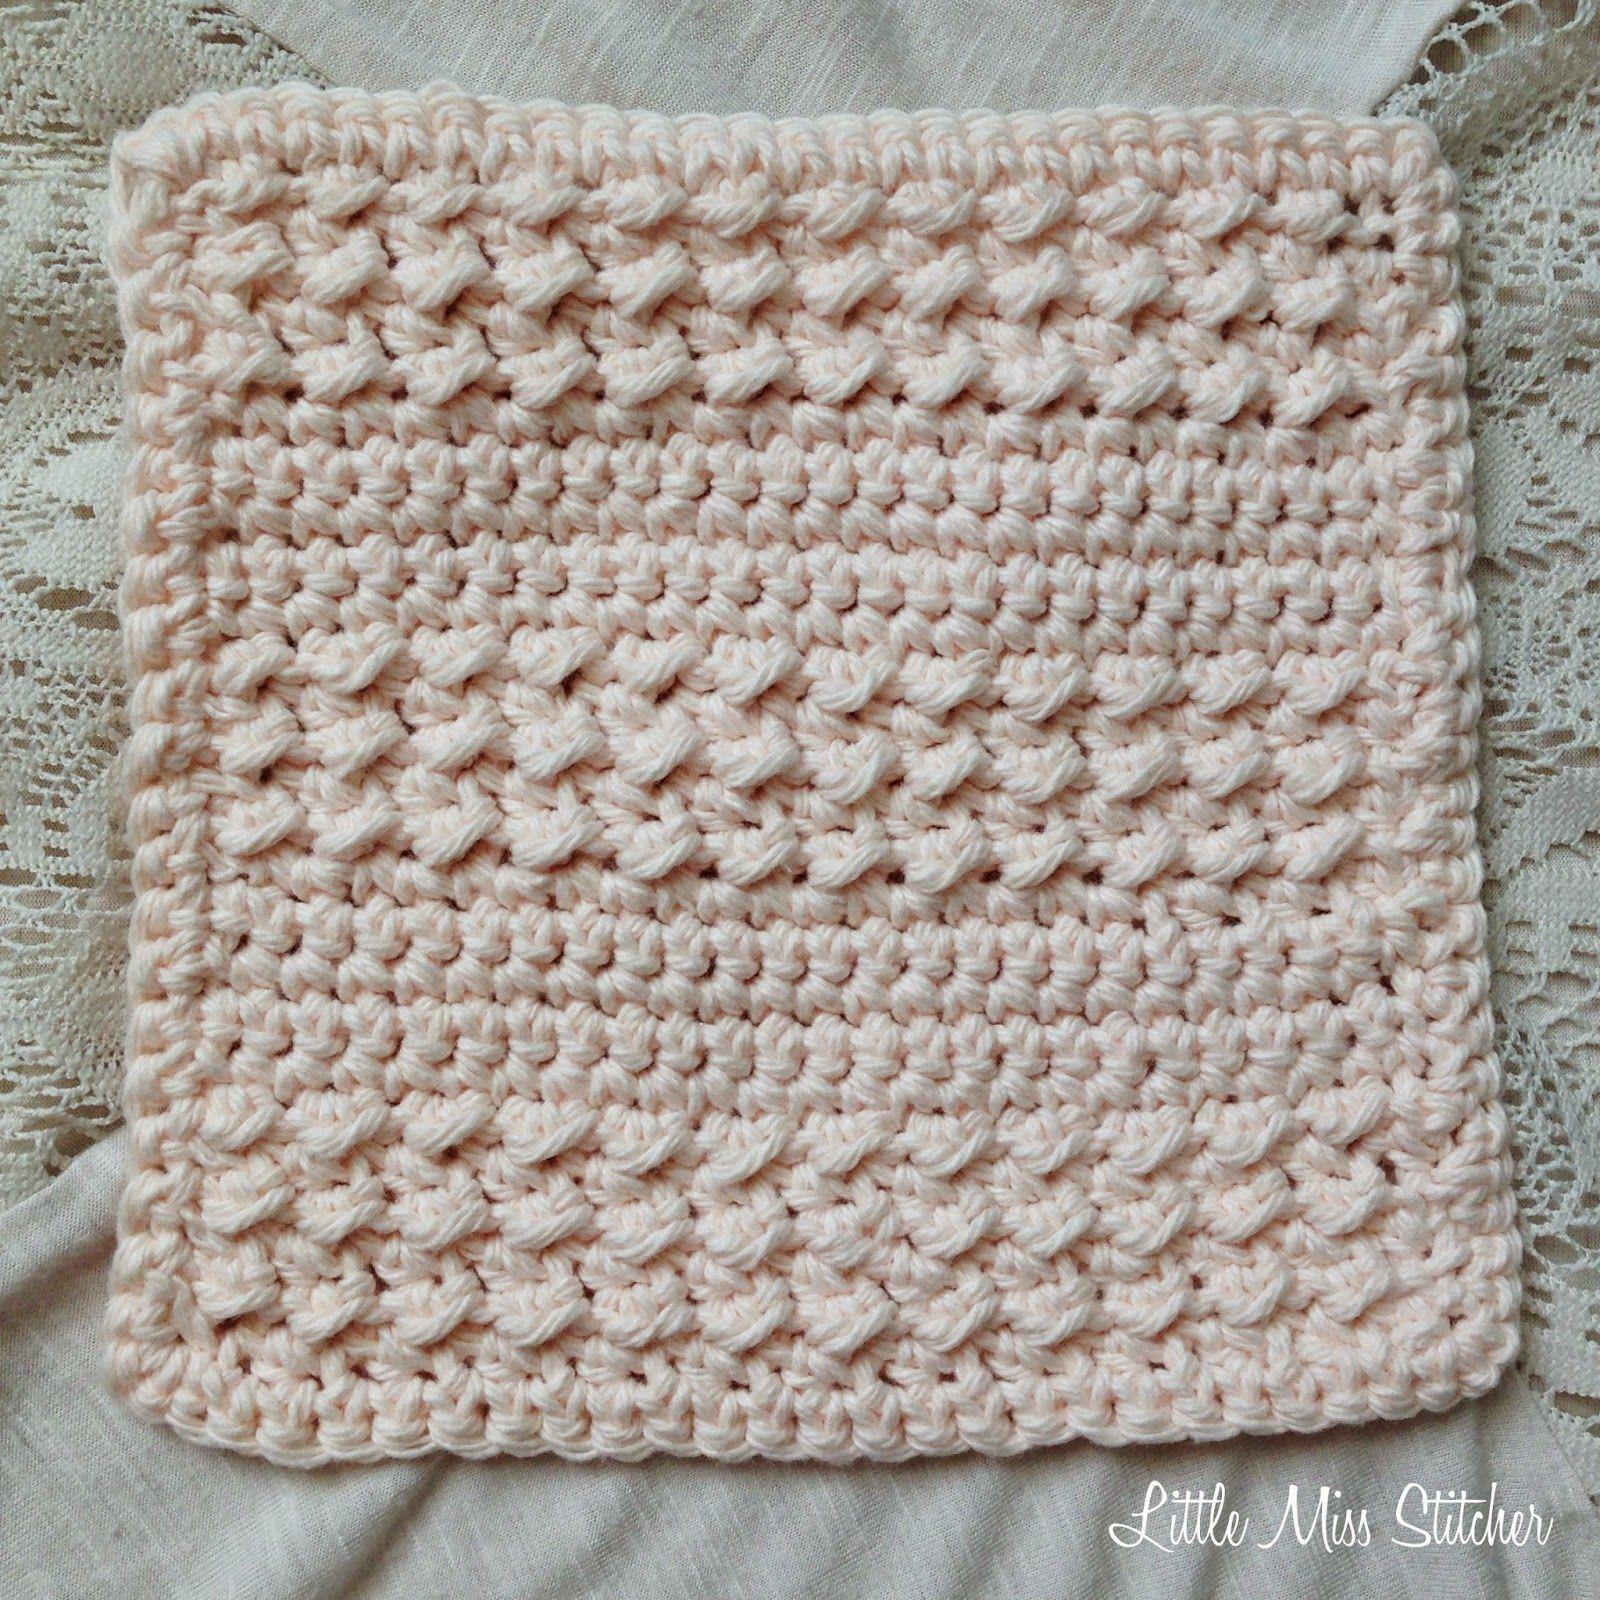 Little Miss Stitcher: 5 Free Crochet Dishcloth Patterns | Crochet ...